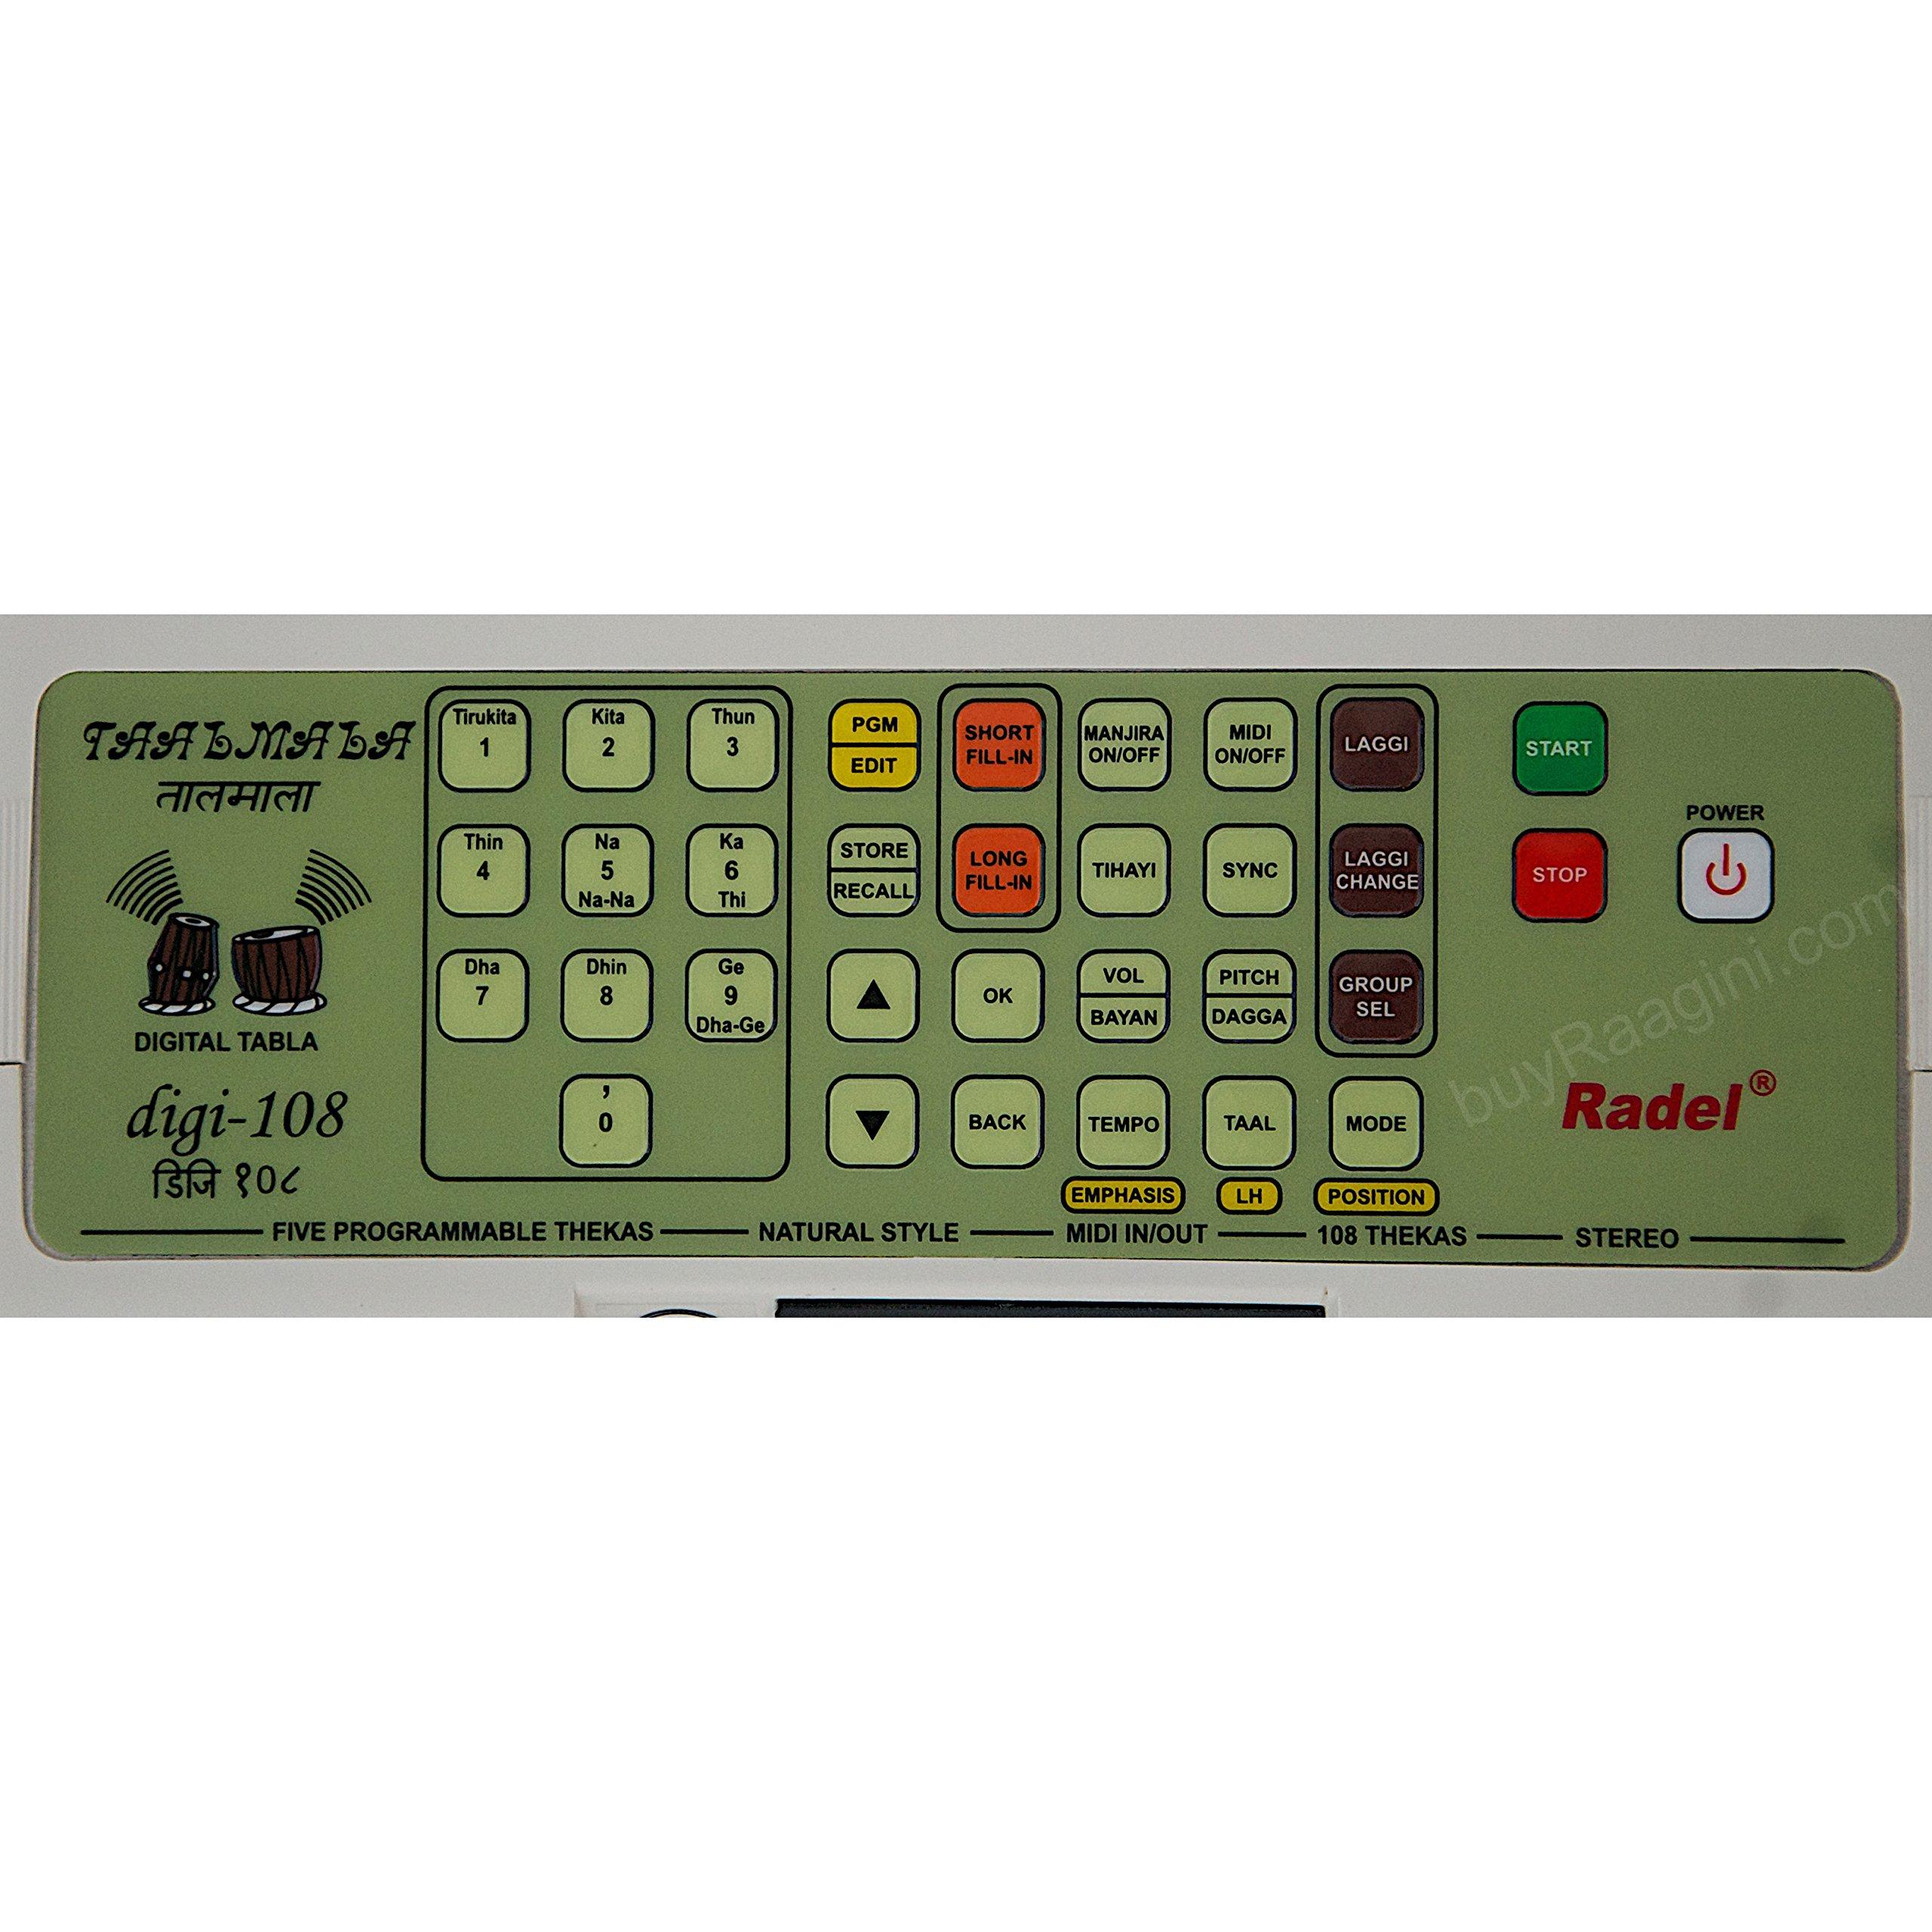 Electronic Tabla - RADEL Taalmala - Digi 108, Electronic Tabla & Manjira - Tabla Sampler, DJ Tabla Sound Machine, Instruction Manual, Power Cord, Bag (US-PDI-AAF) by Radel at buyRaagini.com (Image #5)